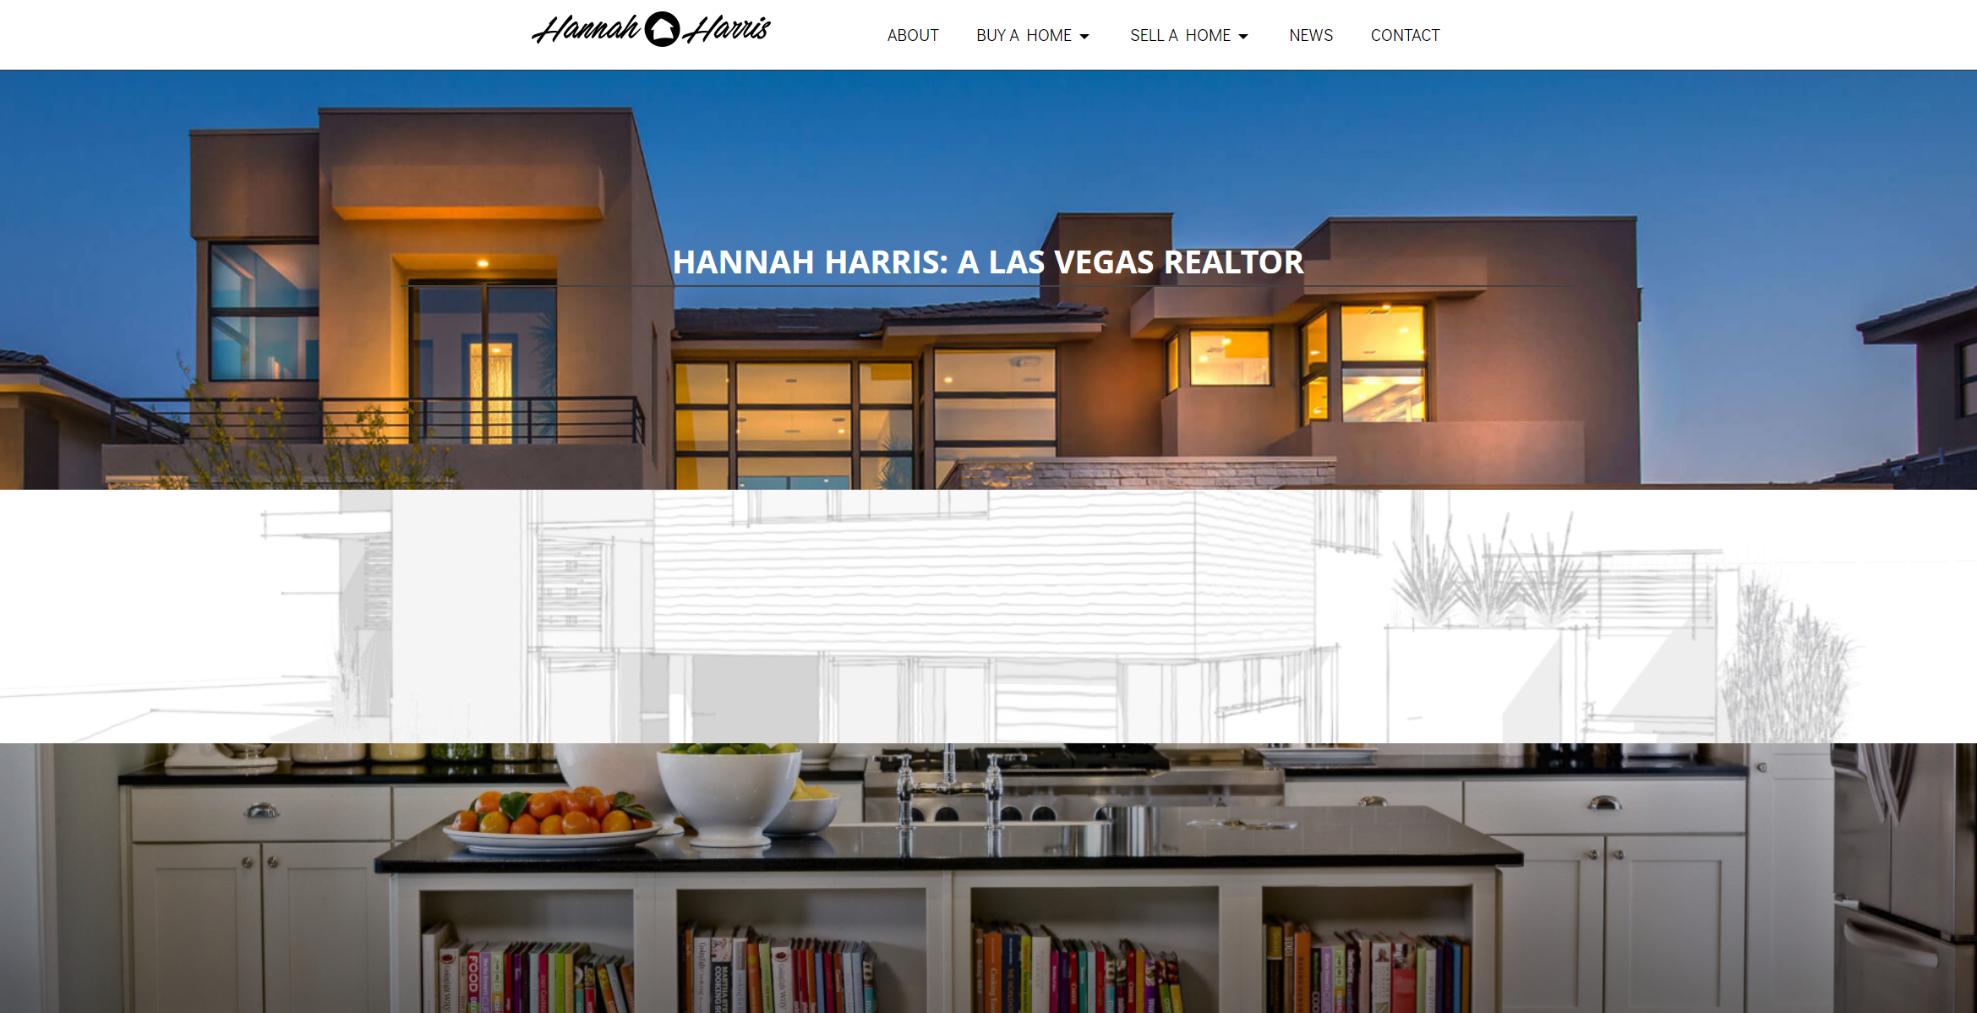 las vegas website development by 702 Pros LLC for Hannah Harris | Justin Young